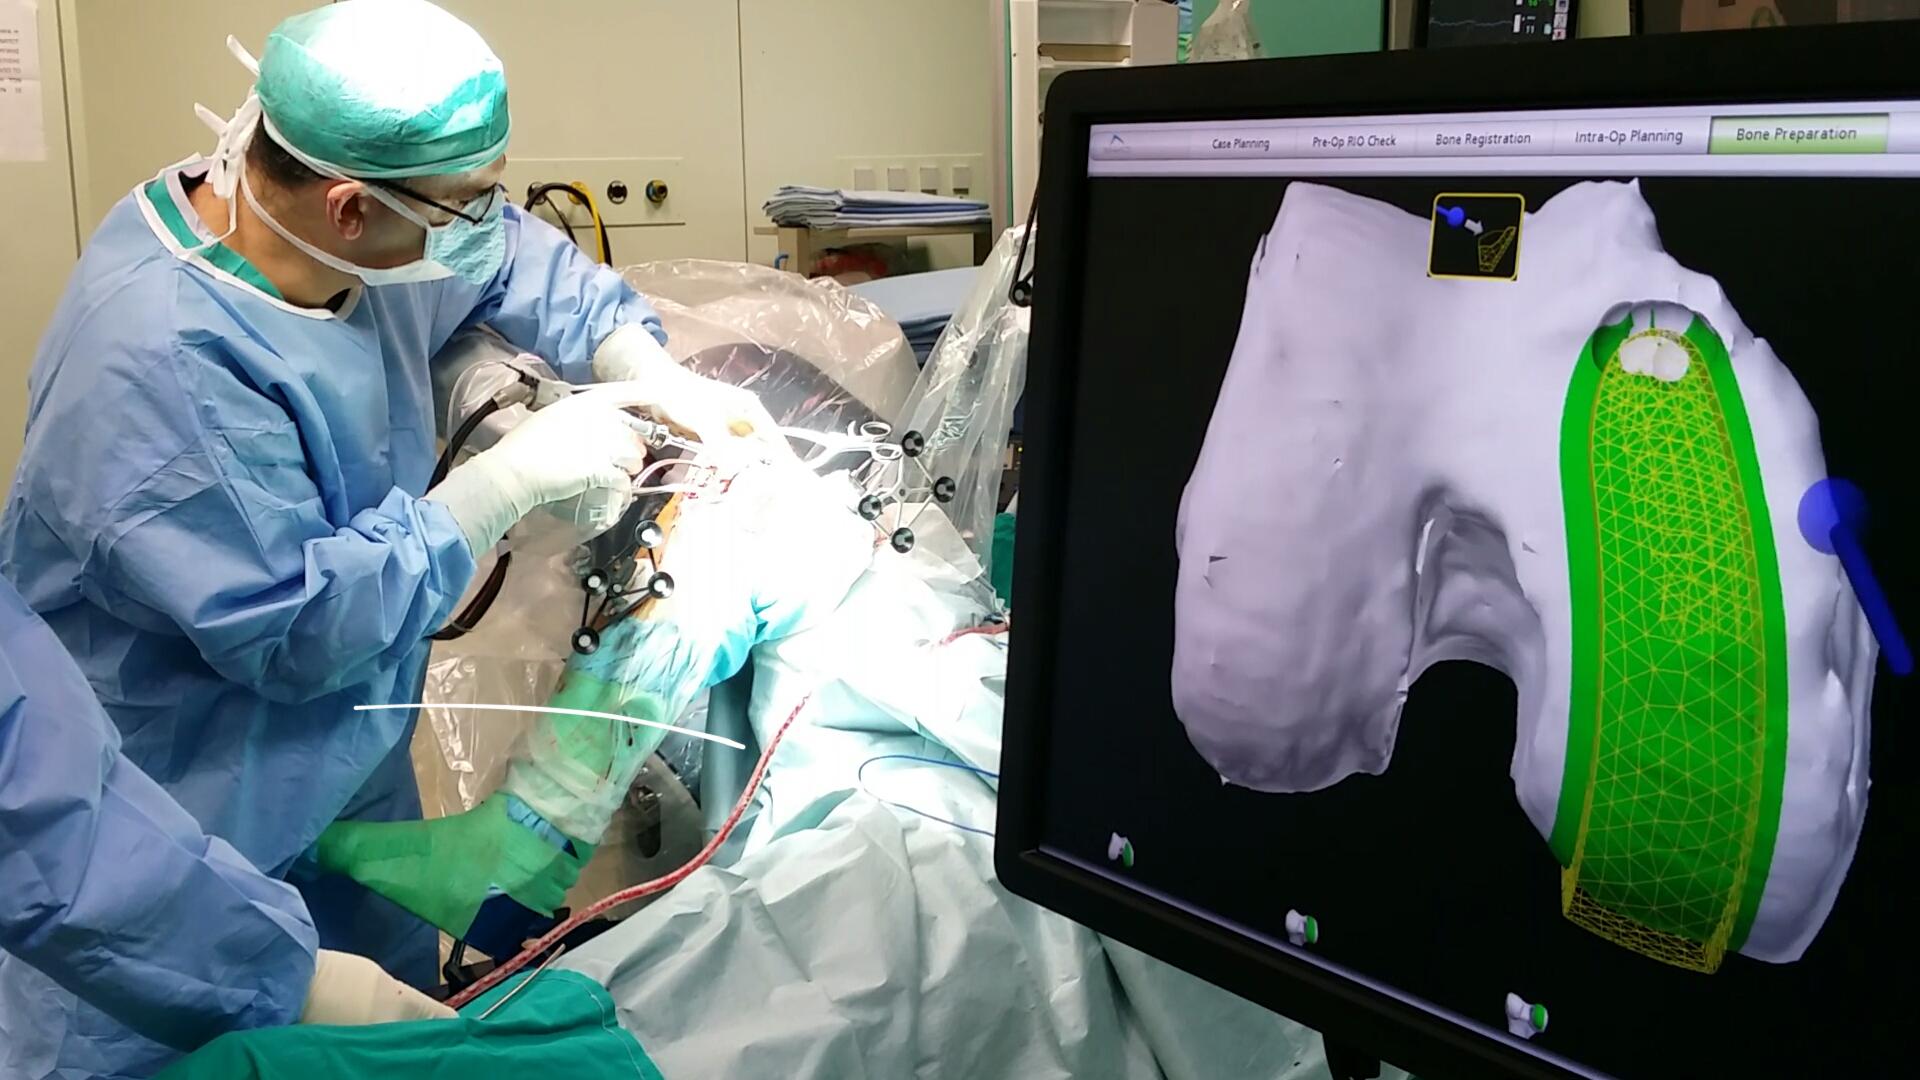 Orthopedic Neurology Photo